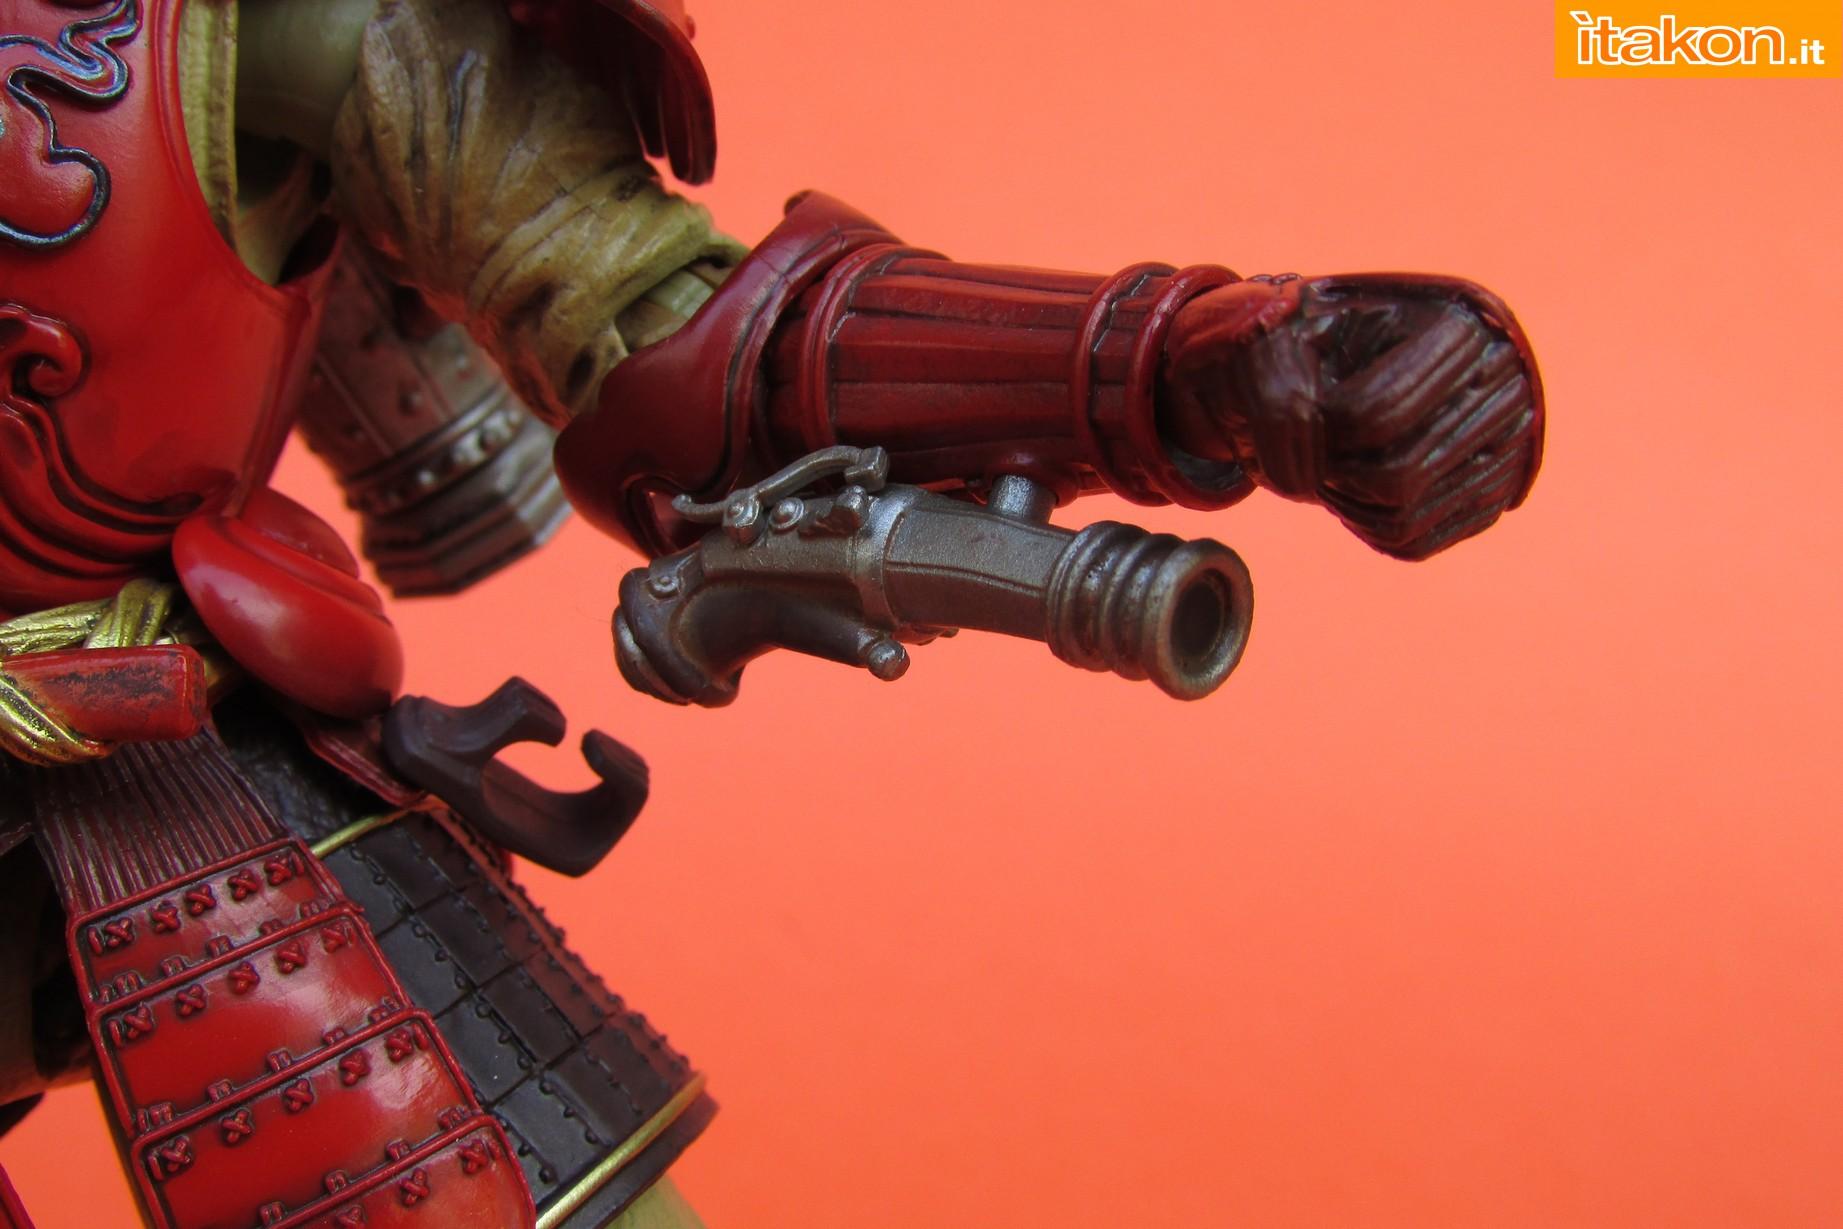 Link a Marvel Comics Koutetsu Samurai Iron Man Mark 3 Meishou MANGA REALIZATION review Bandai Itakon.it44